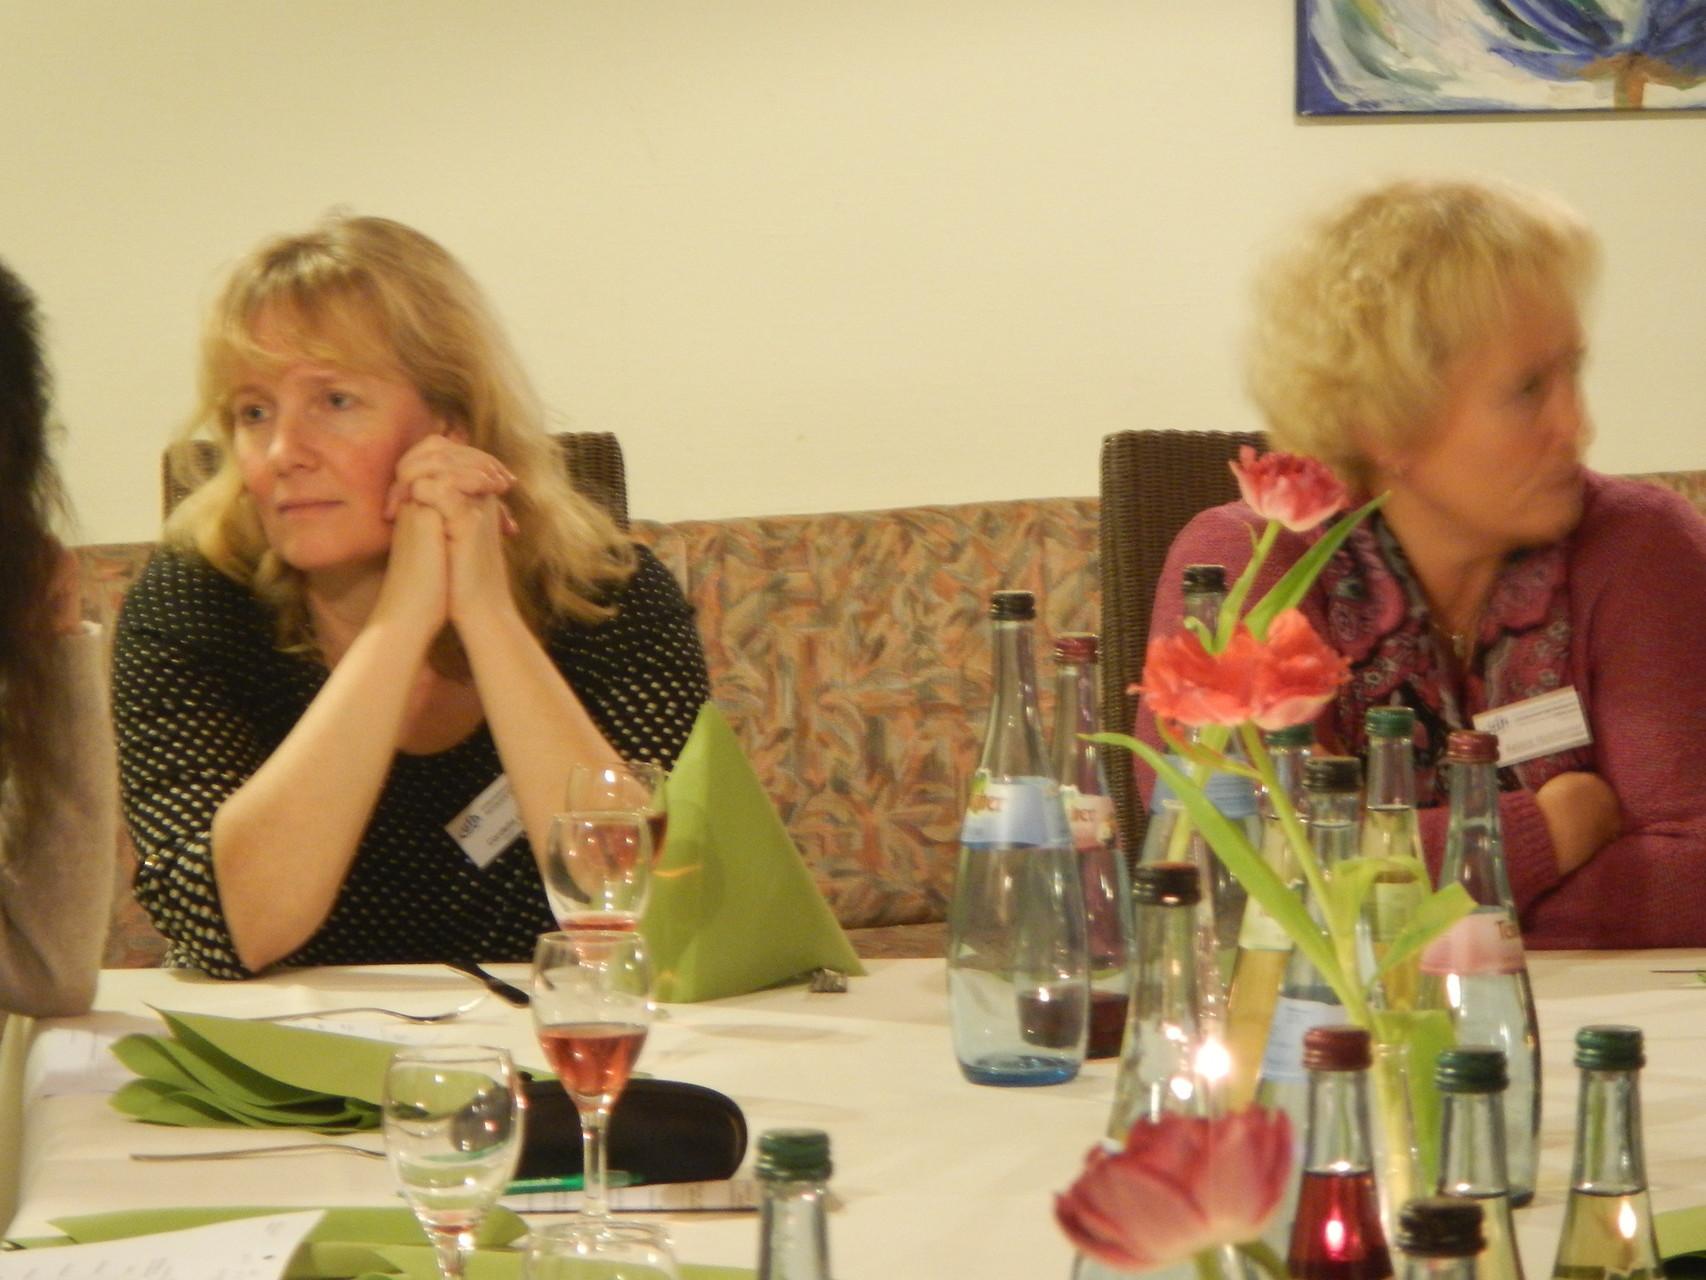 ufh Vortrag AOK - Teilnehmer